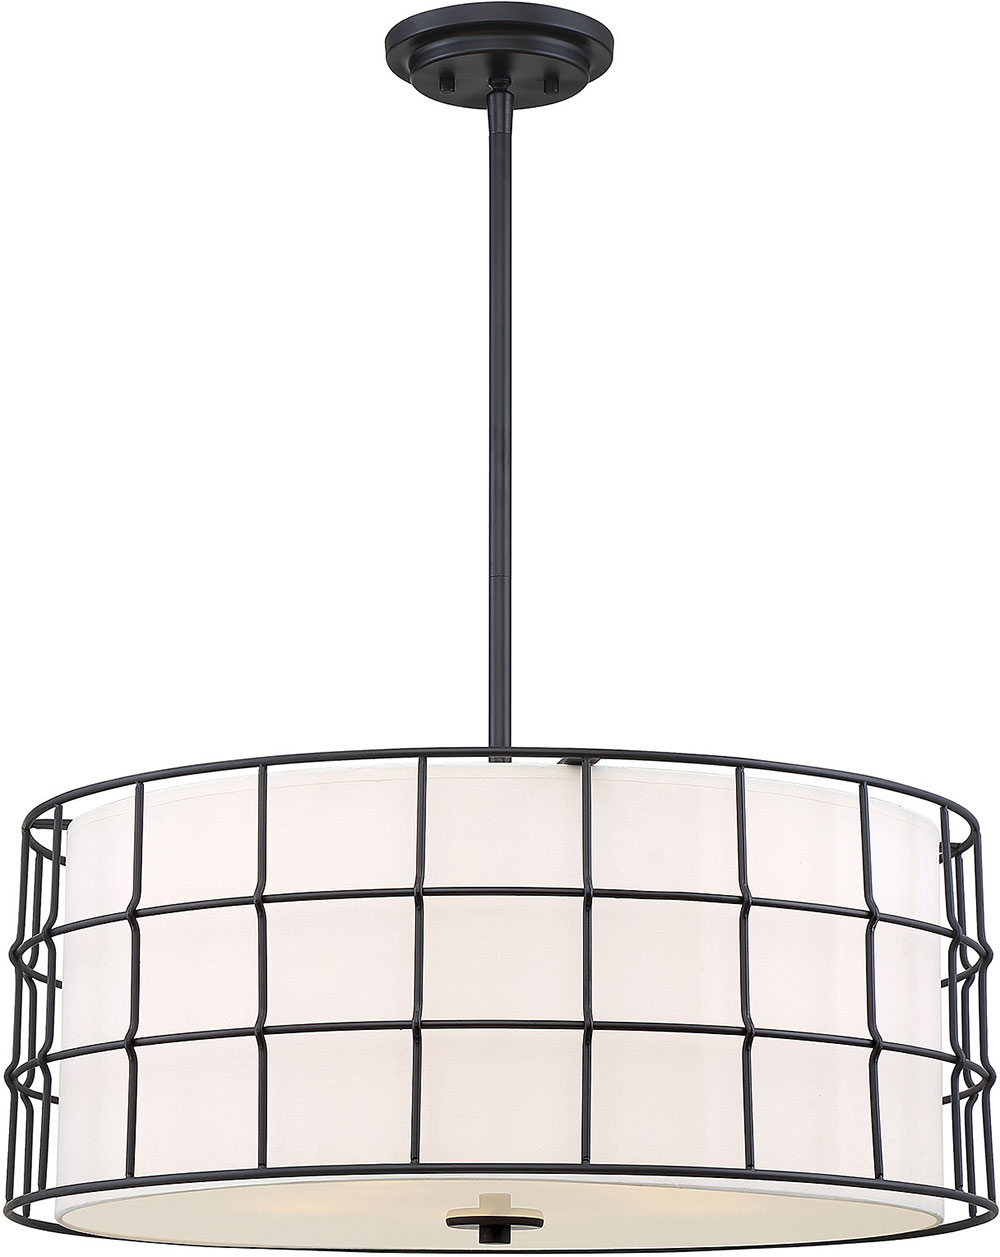 Savoy House 7 8501 5 89 Hayden Contemporary Black Drum Pendant Lighting Fixture Pertaining To Hayden 5 Light Shaded Chandeliers (View 11 of 30)